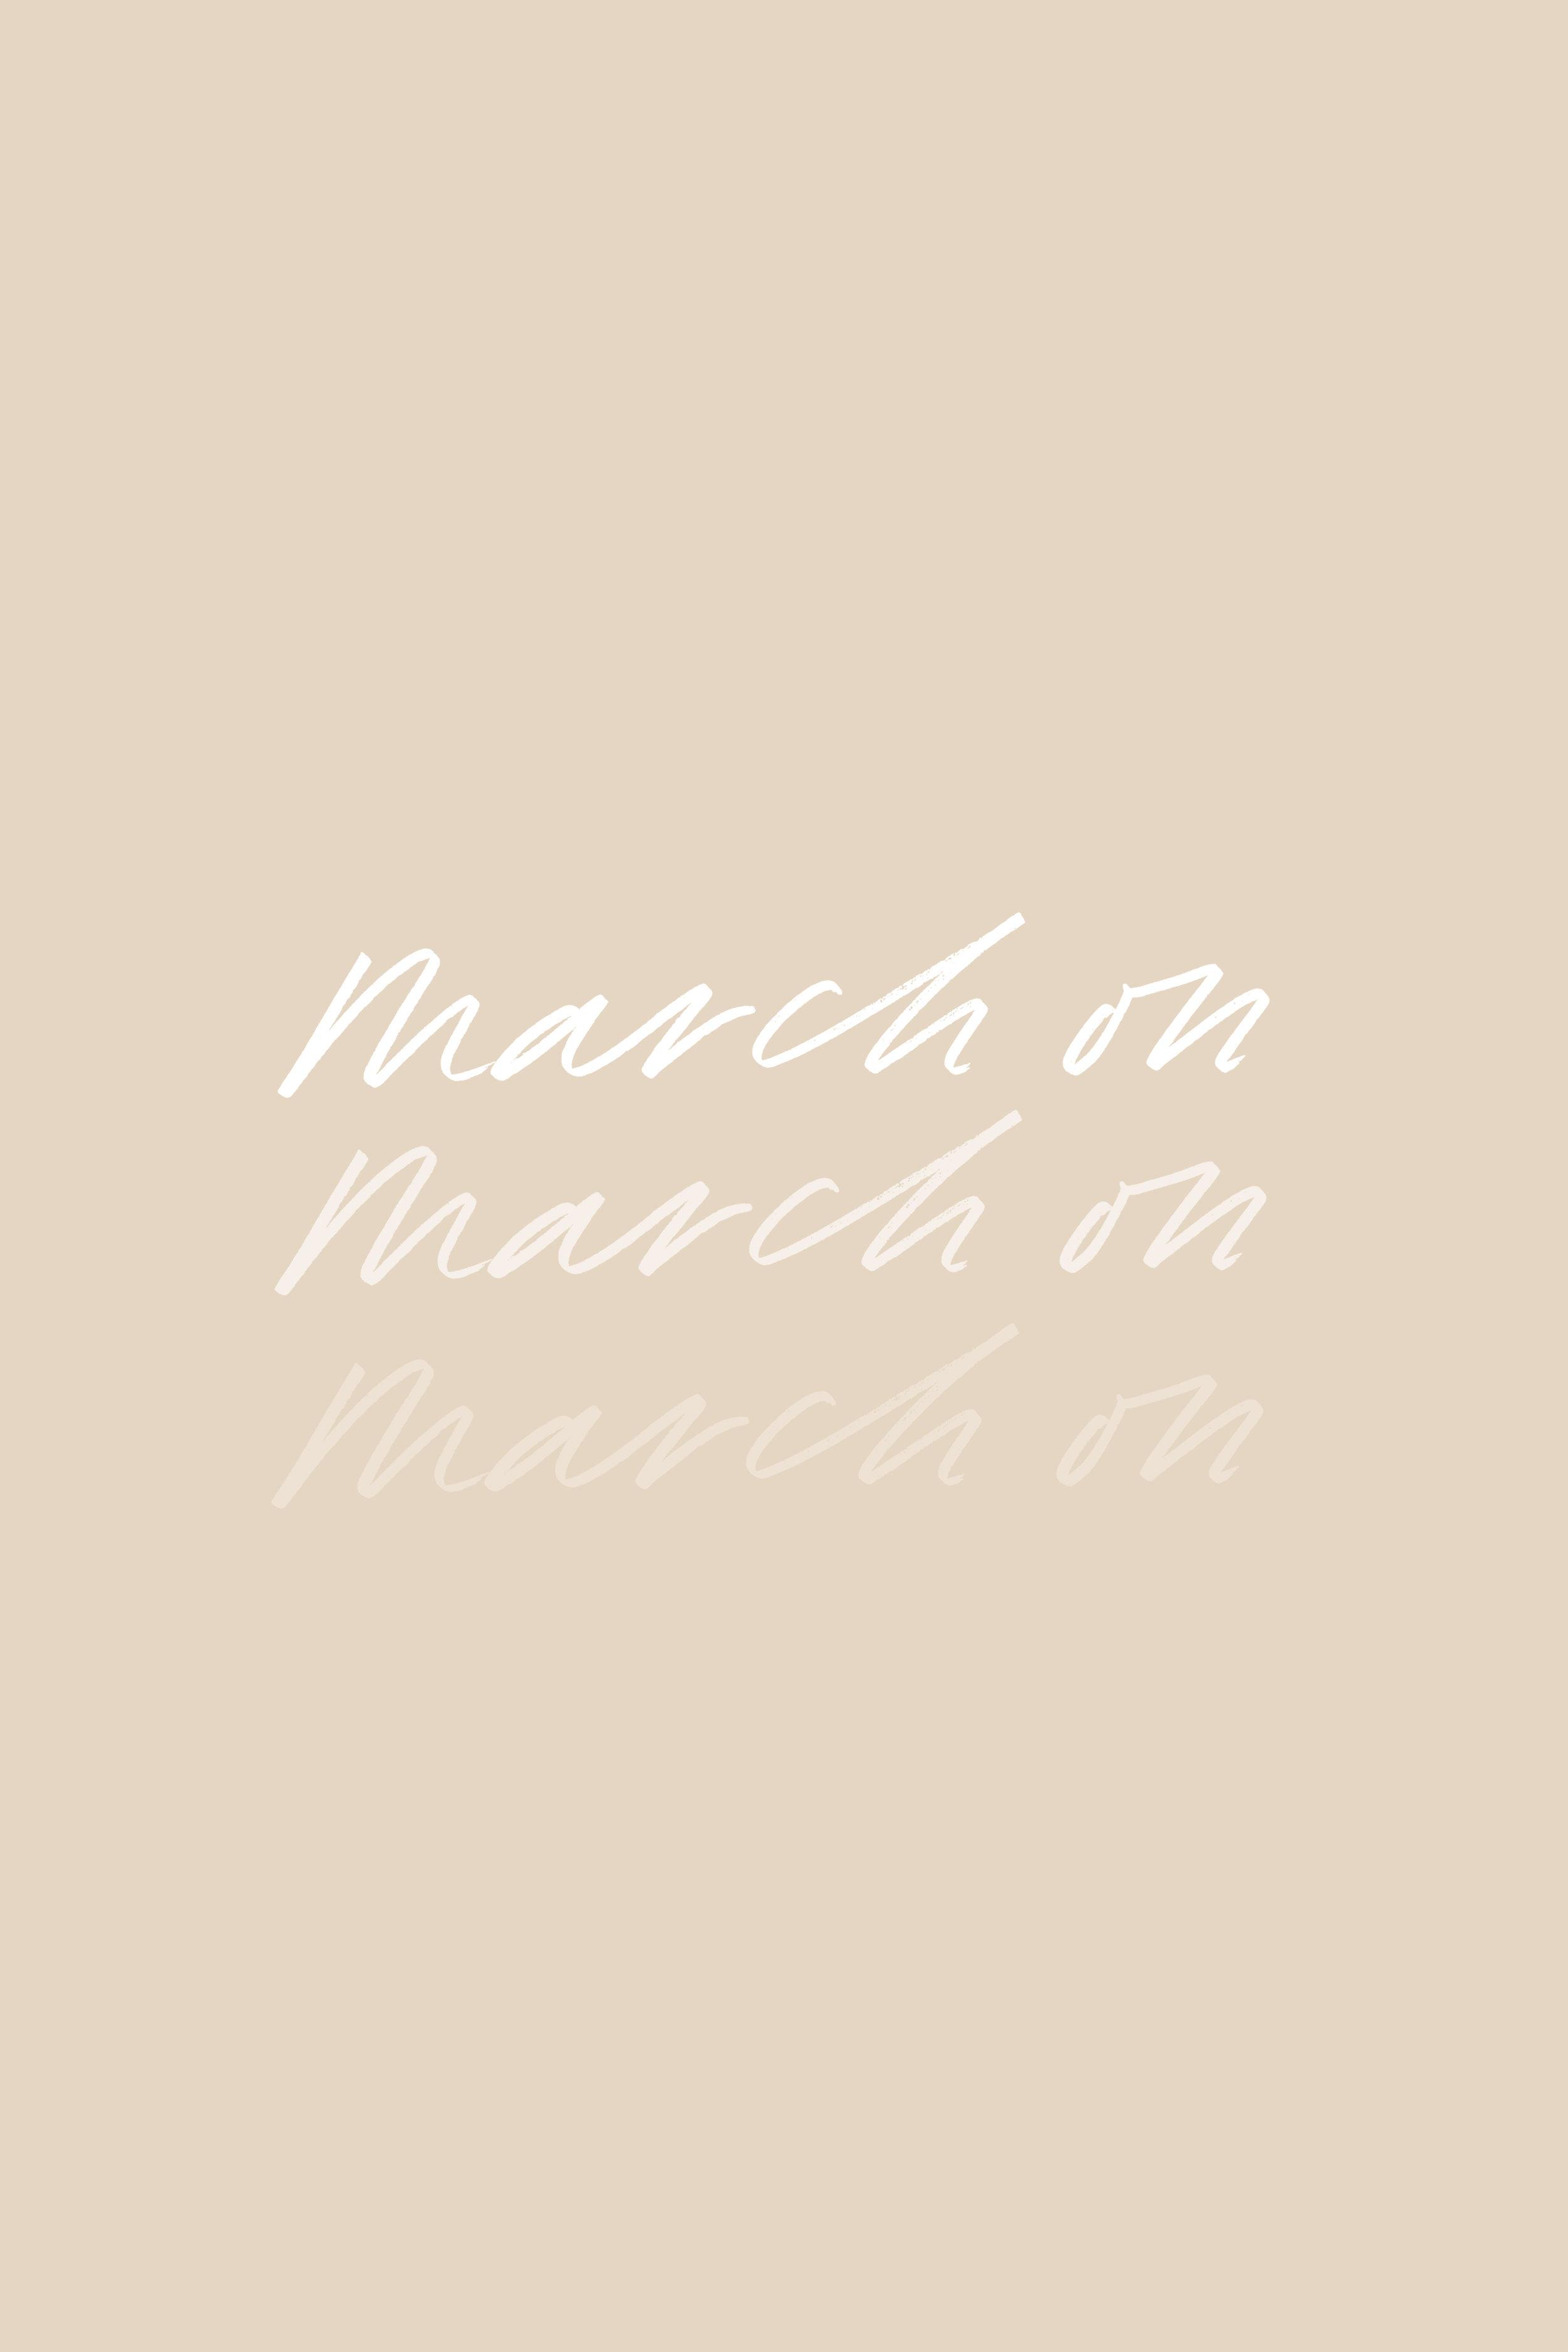 march on.jpg